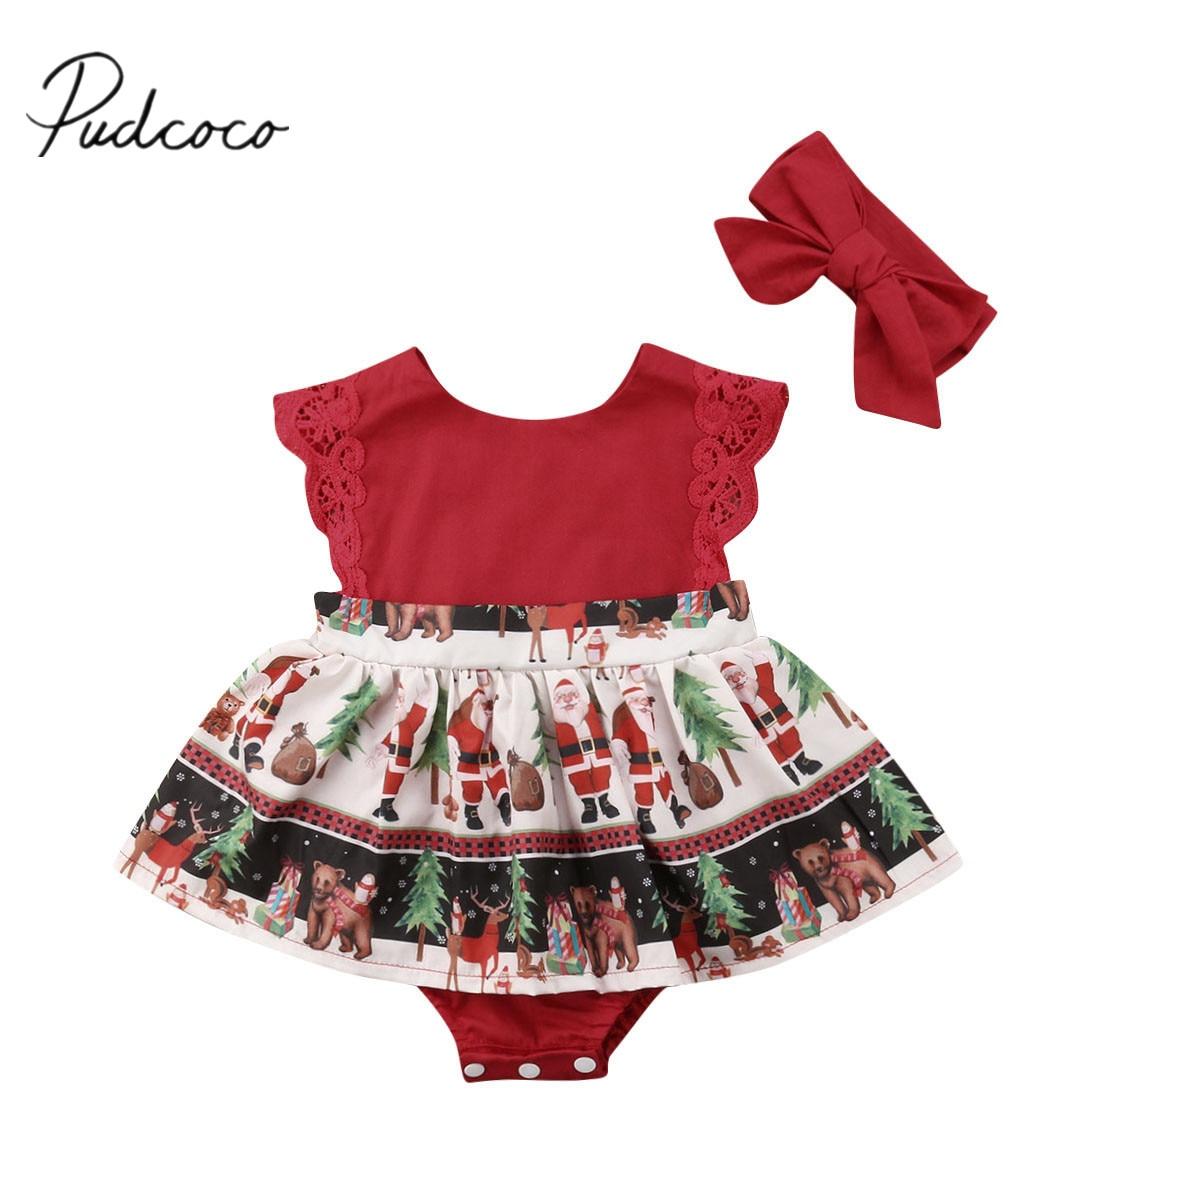 2018 Brand New Christmas Toddler Baby Girls Santa Romper Dress Lace Sleeve Ruffles Jumpsuits Claus Print Playsuit Dress+Headband